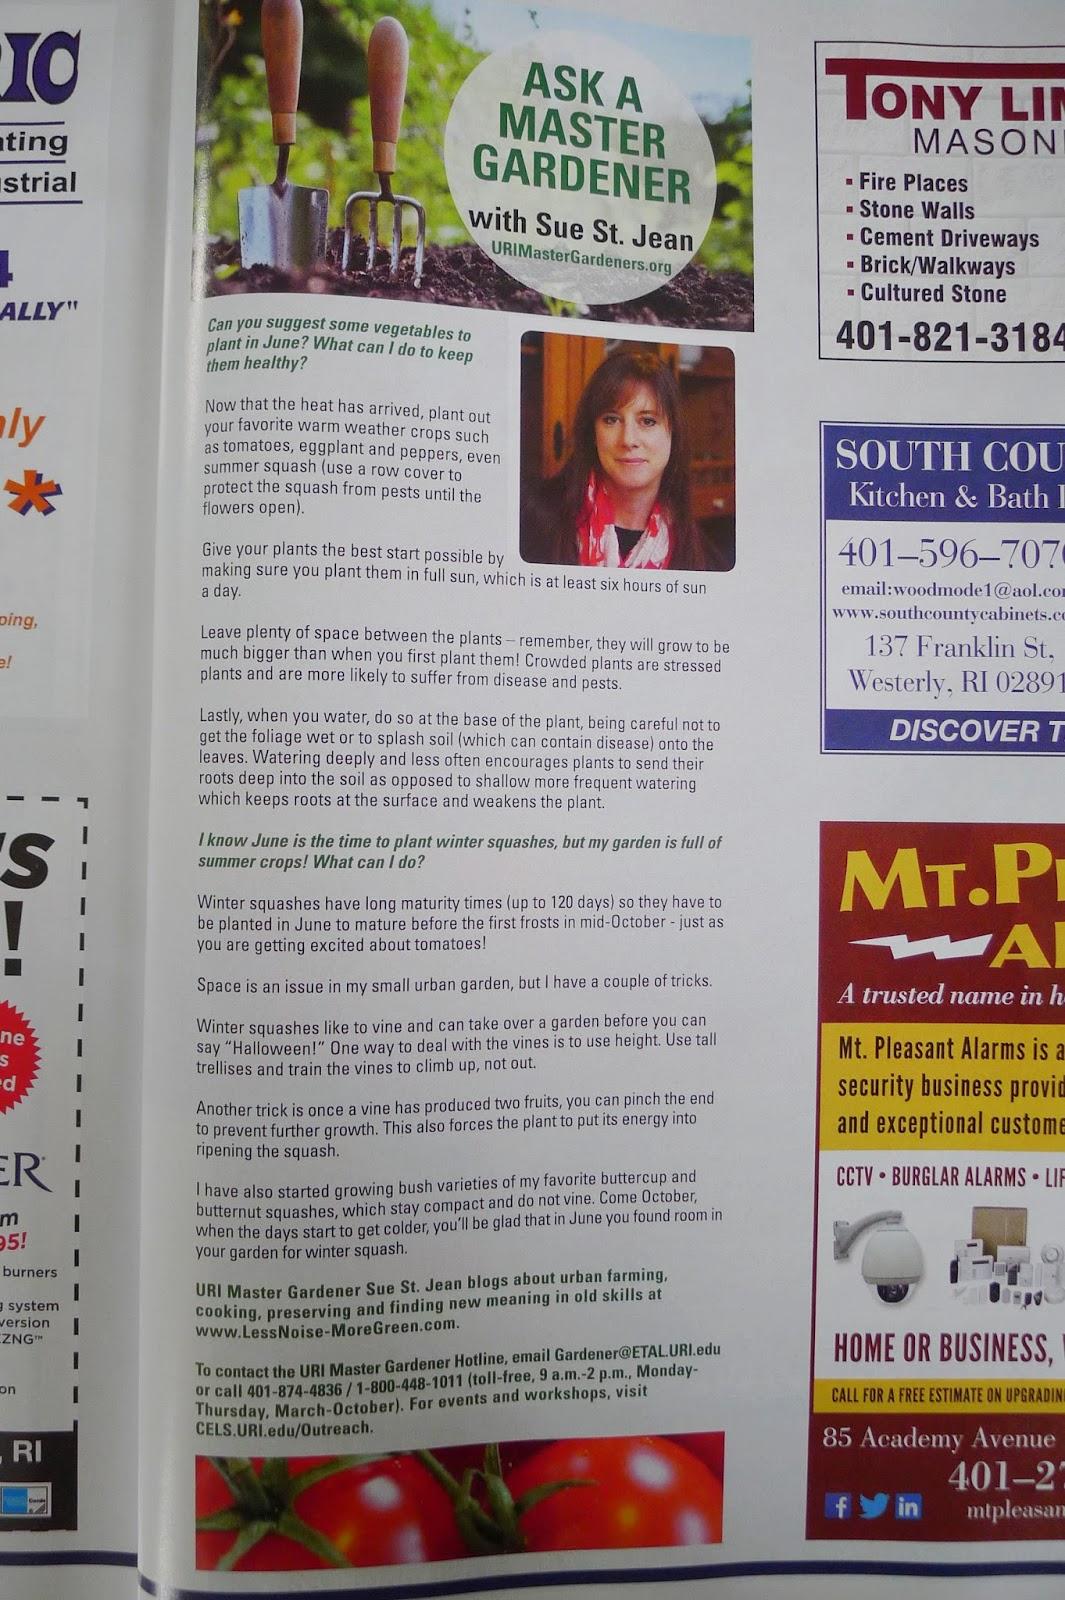 RI Local Magazine, URI Master Gardener